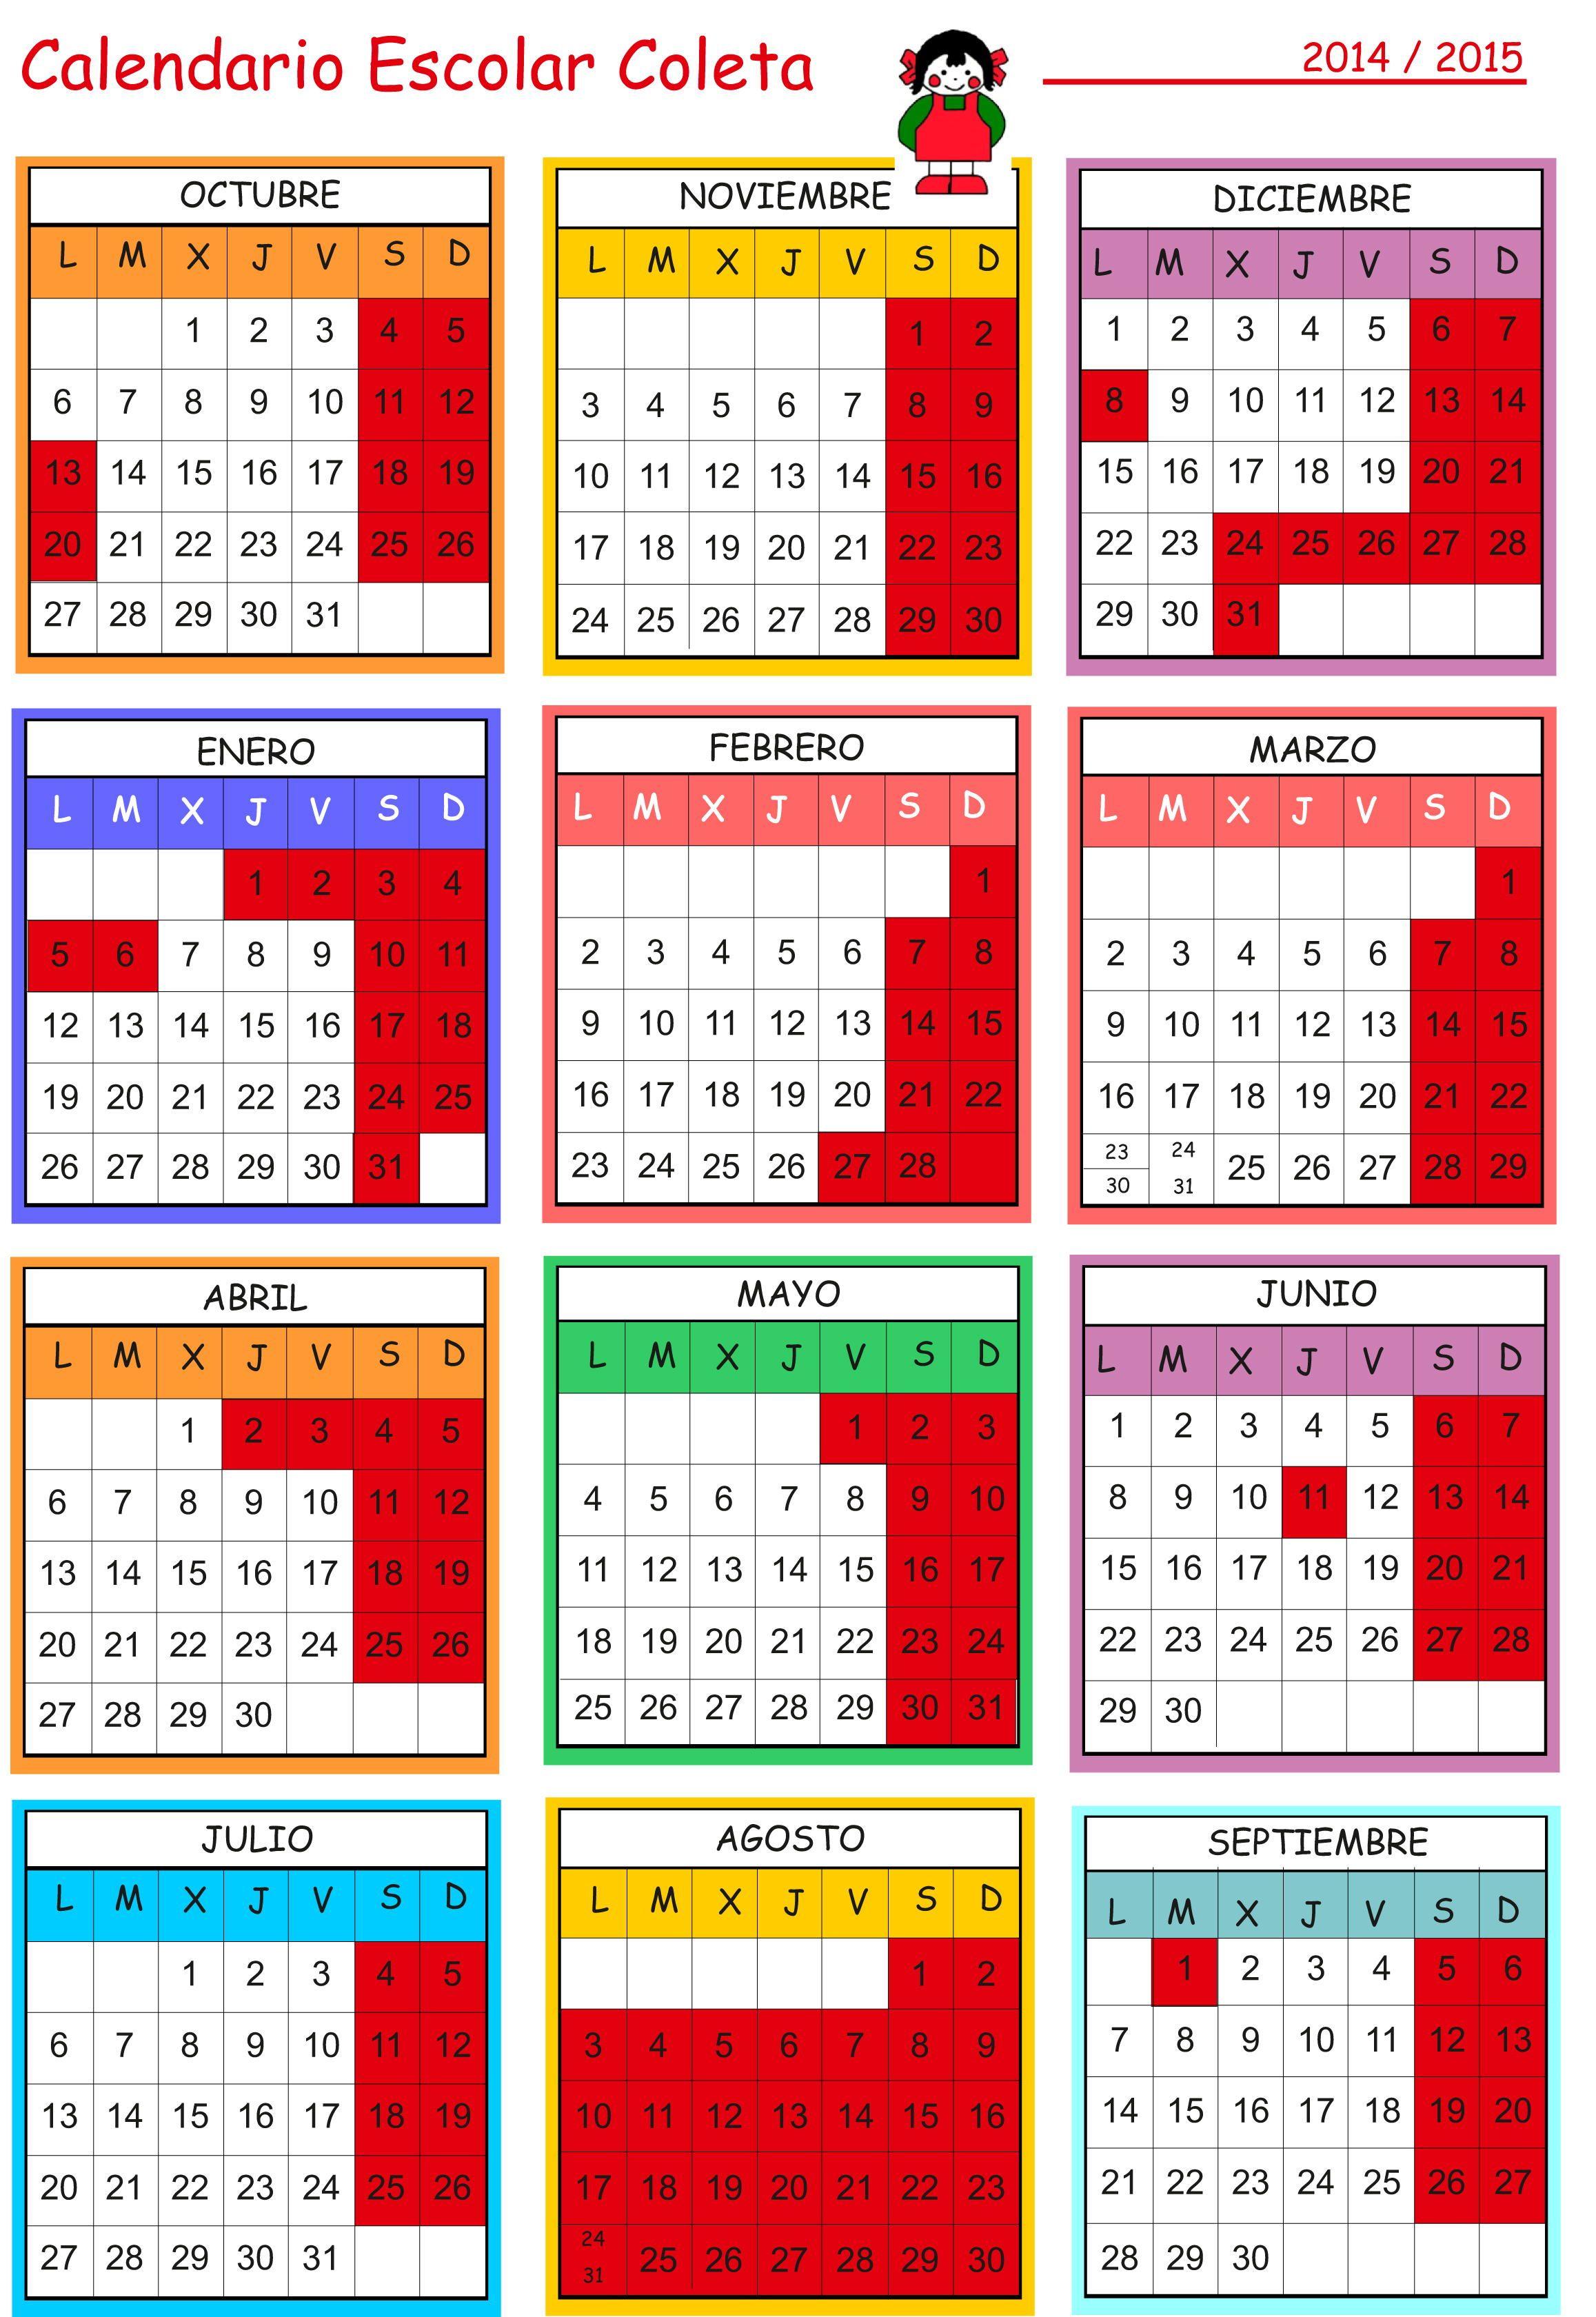 Calendario Escolar Escuela Infantil Coleta 2014-2015